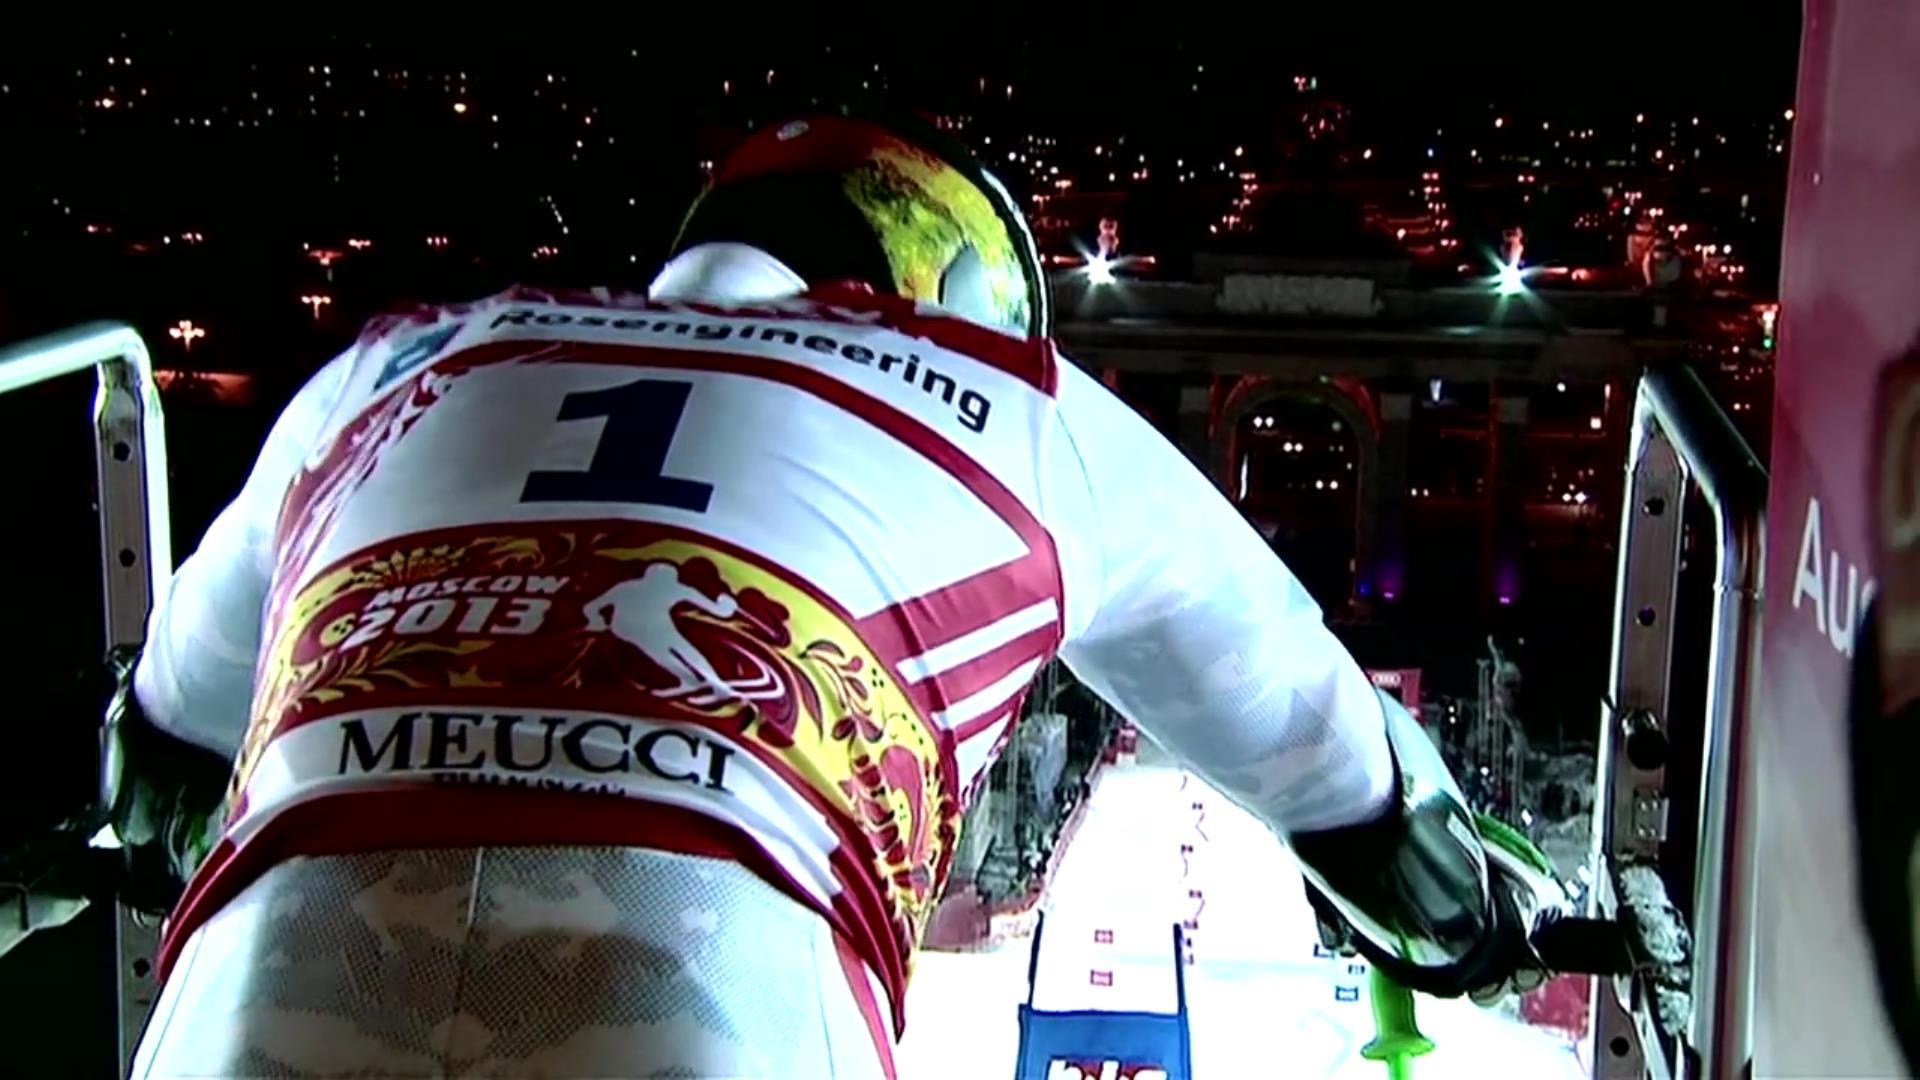 Ski Racing | INSPECTING A RACE COURSE